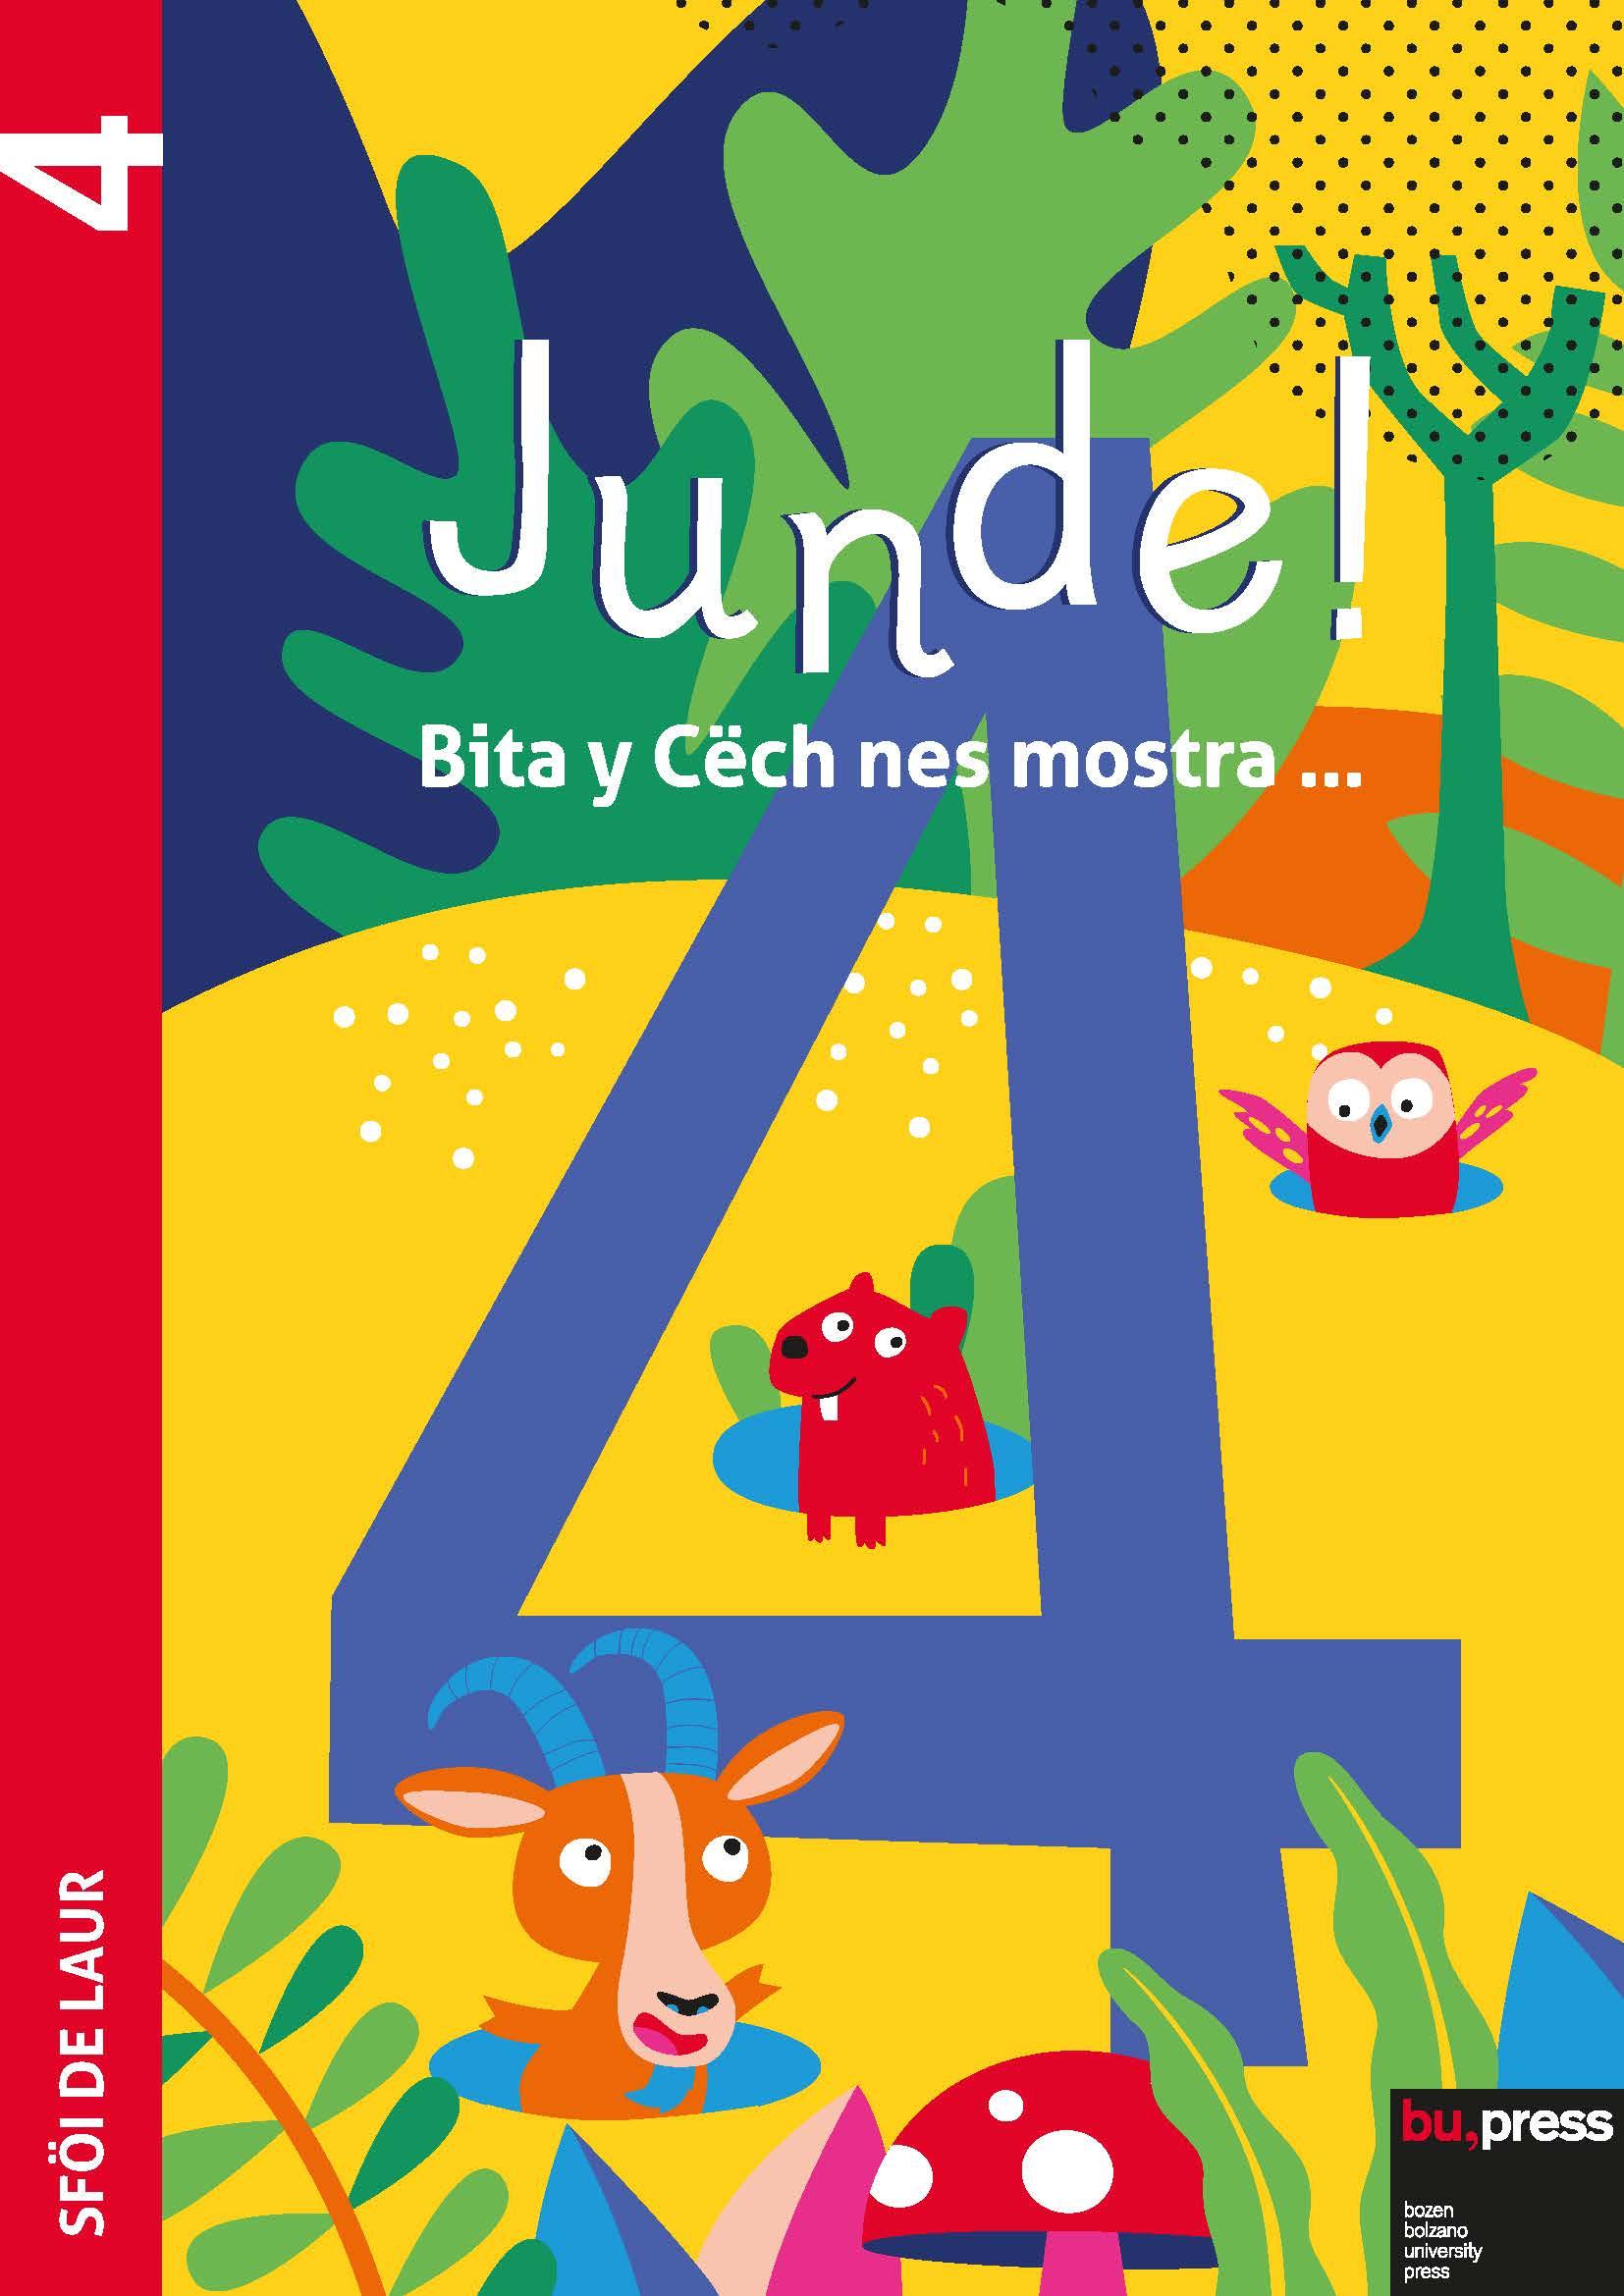 Cover of Junde! 4 – Sföi de laur